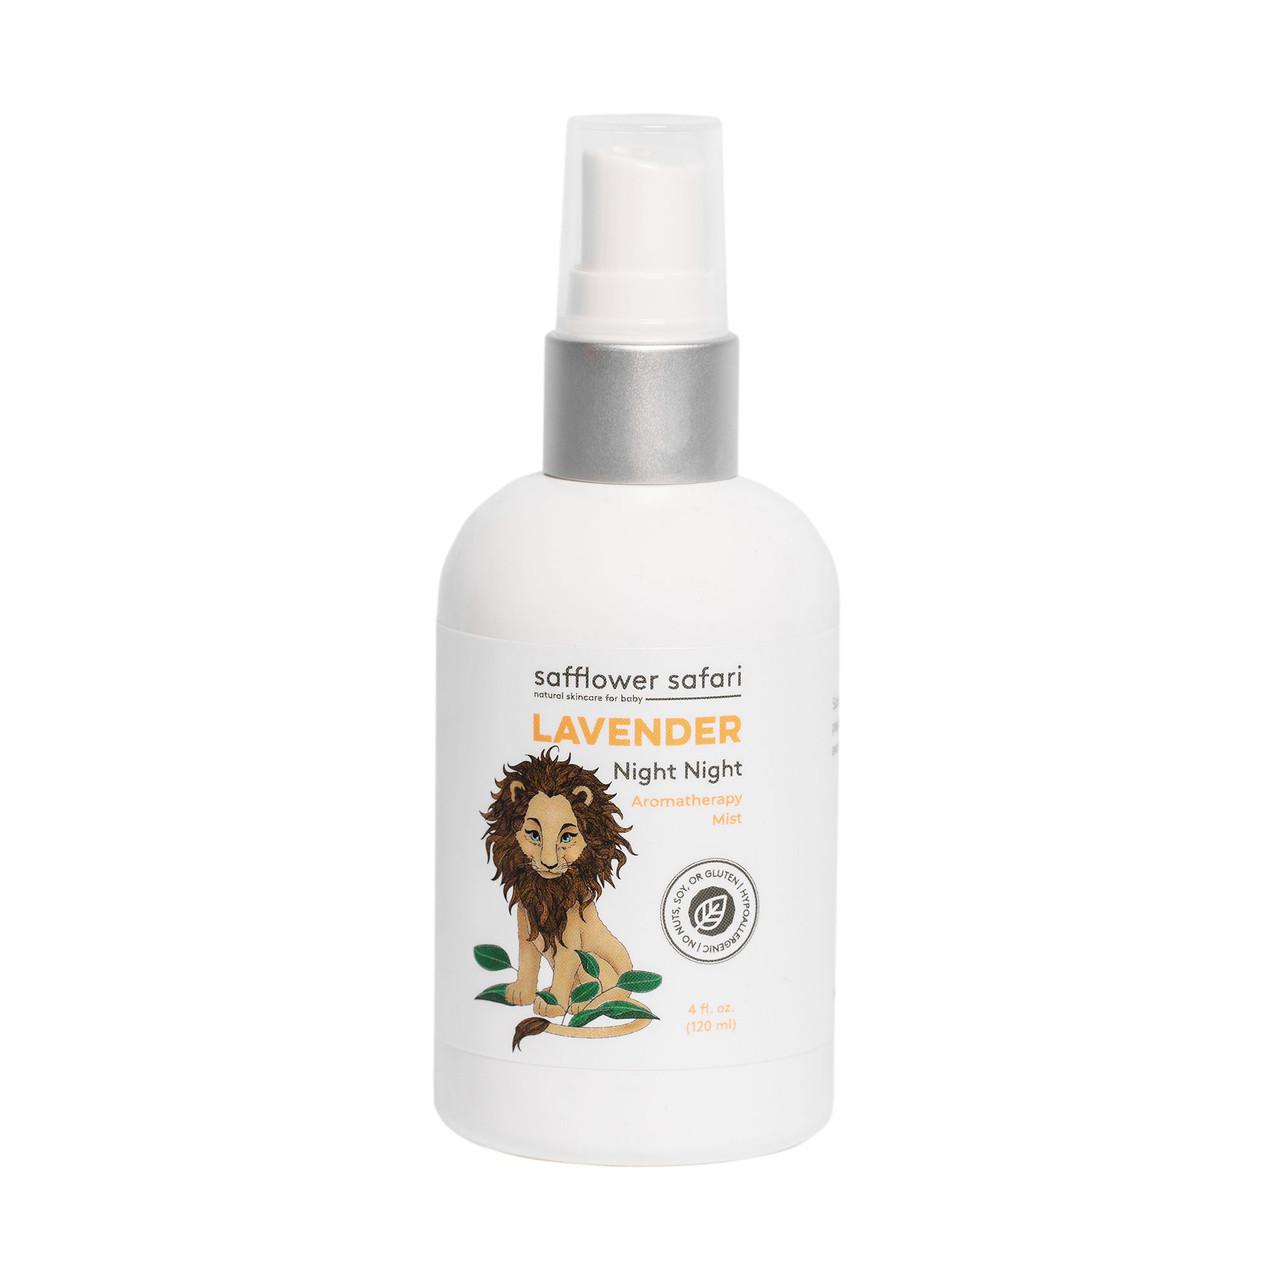 Lavender Aromatherapy Night Night Herbal Mist - Safflower Saffari